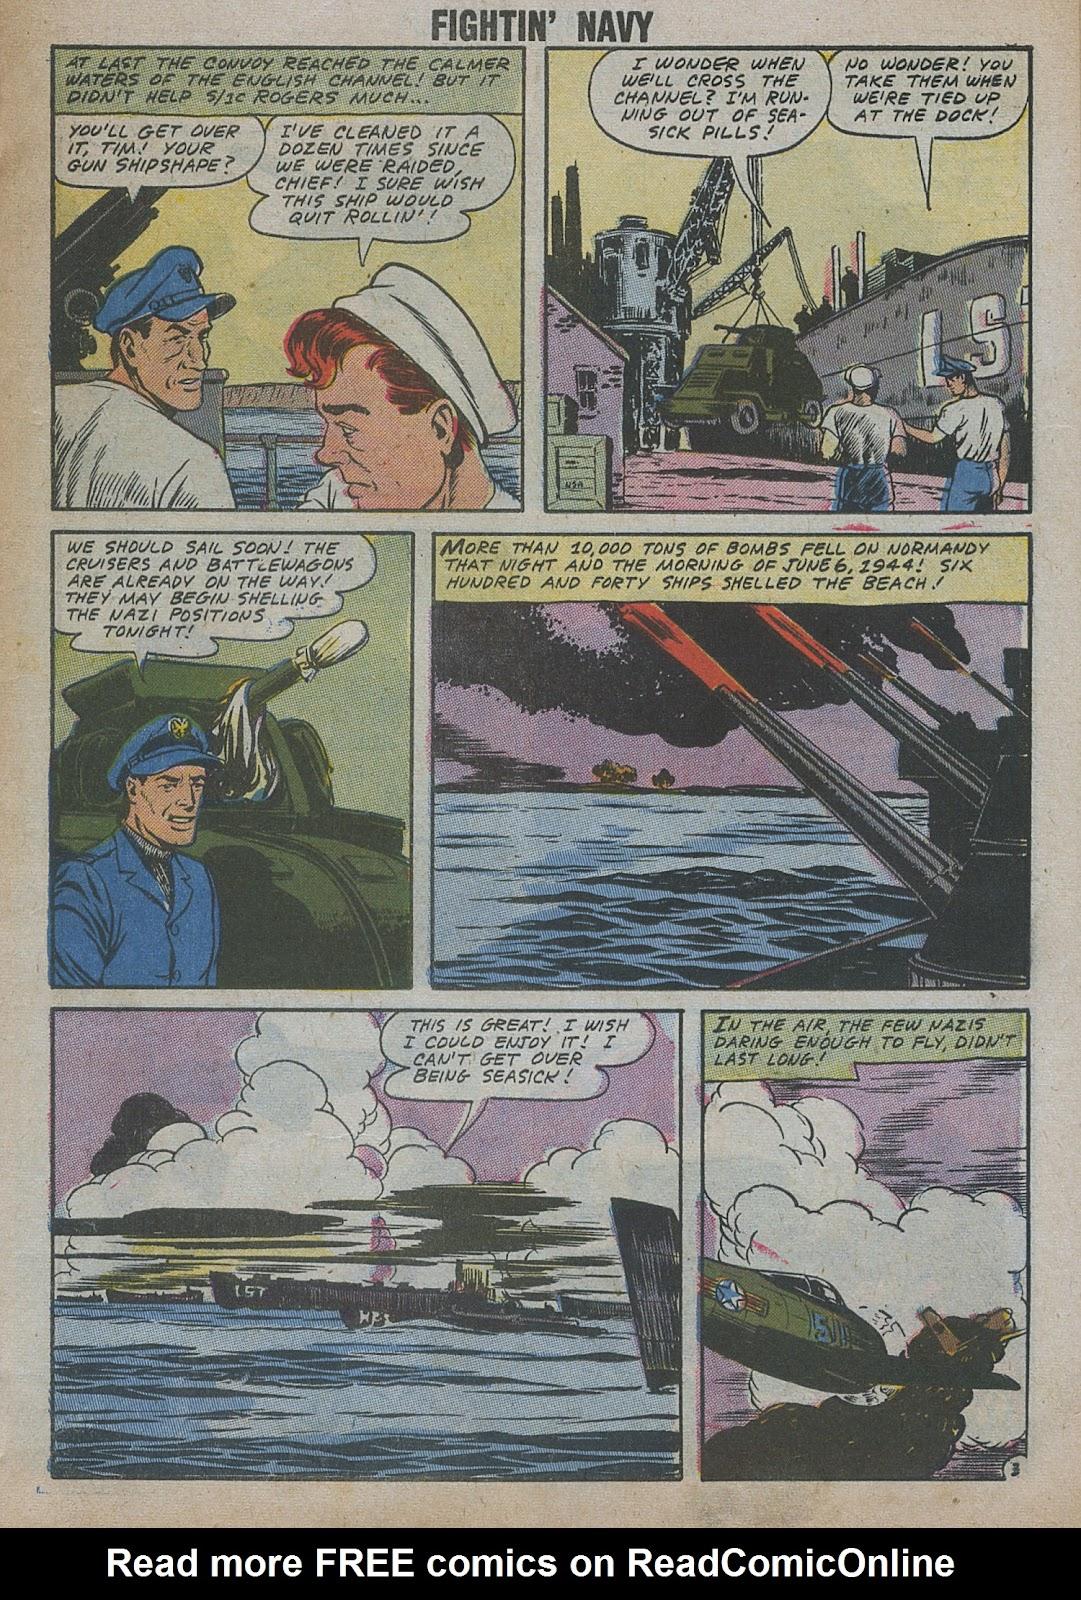 Read online Fightin' Navy comic -  Issue #82 - 13